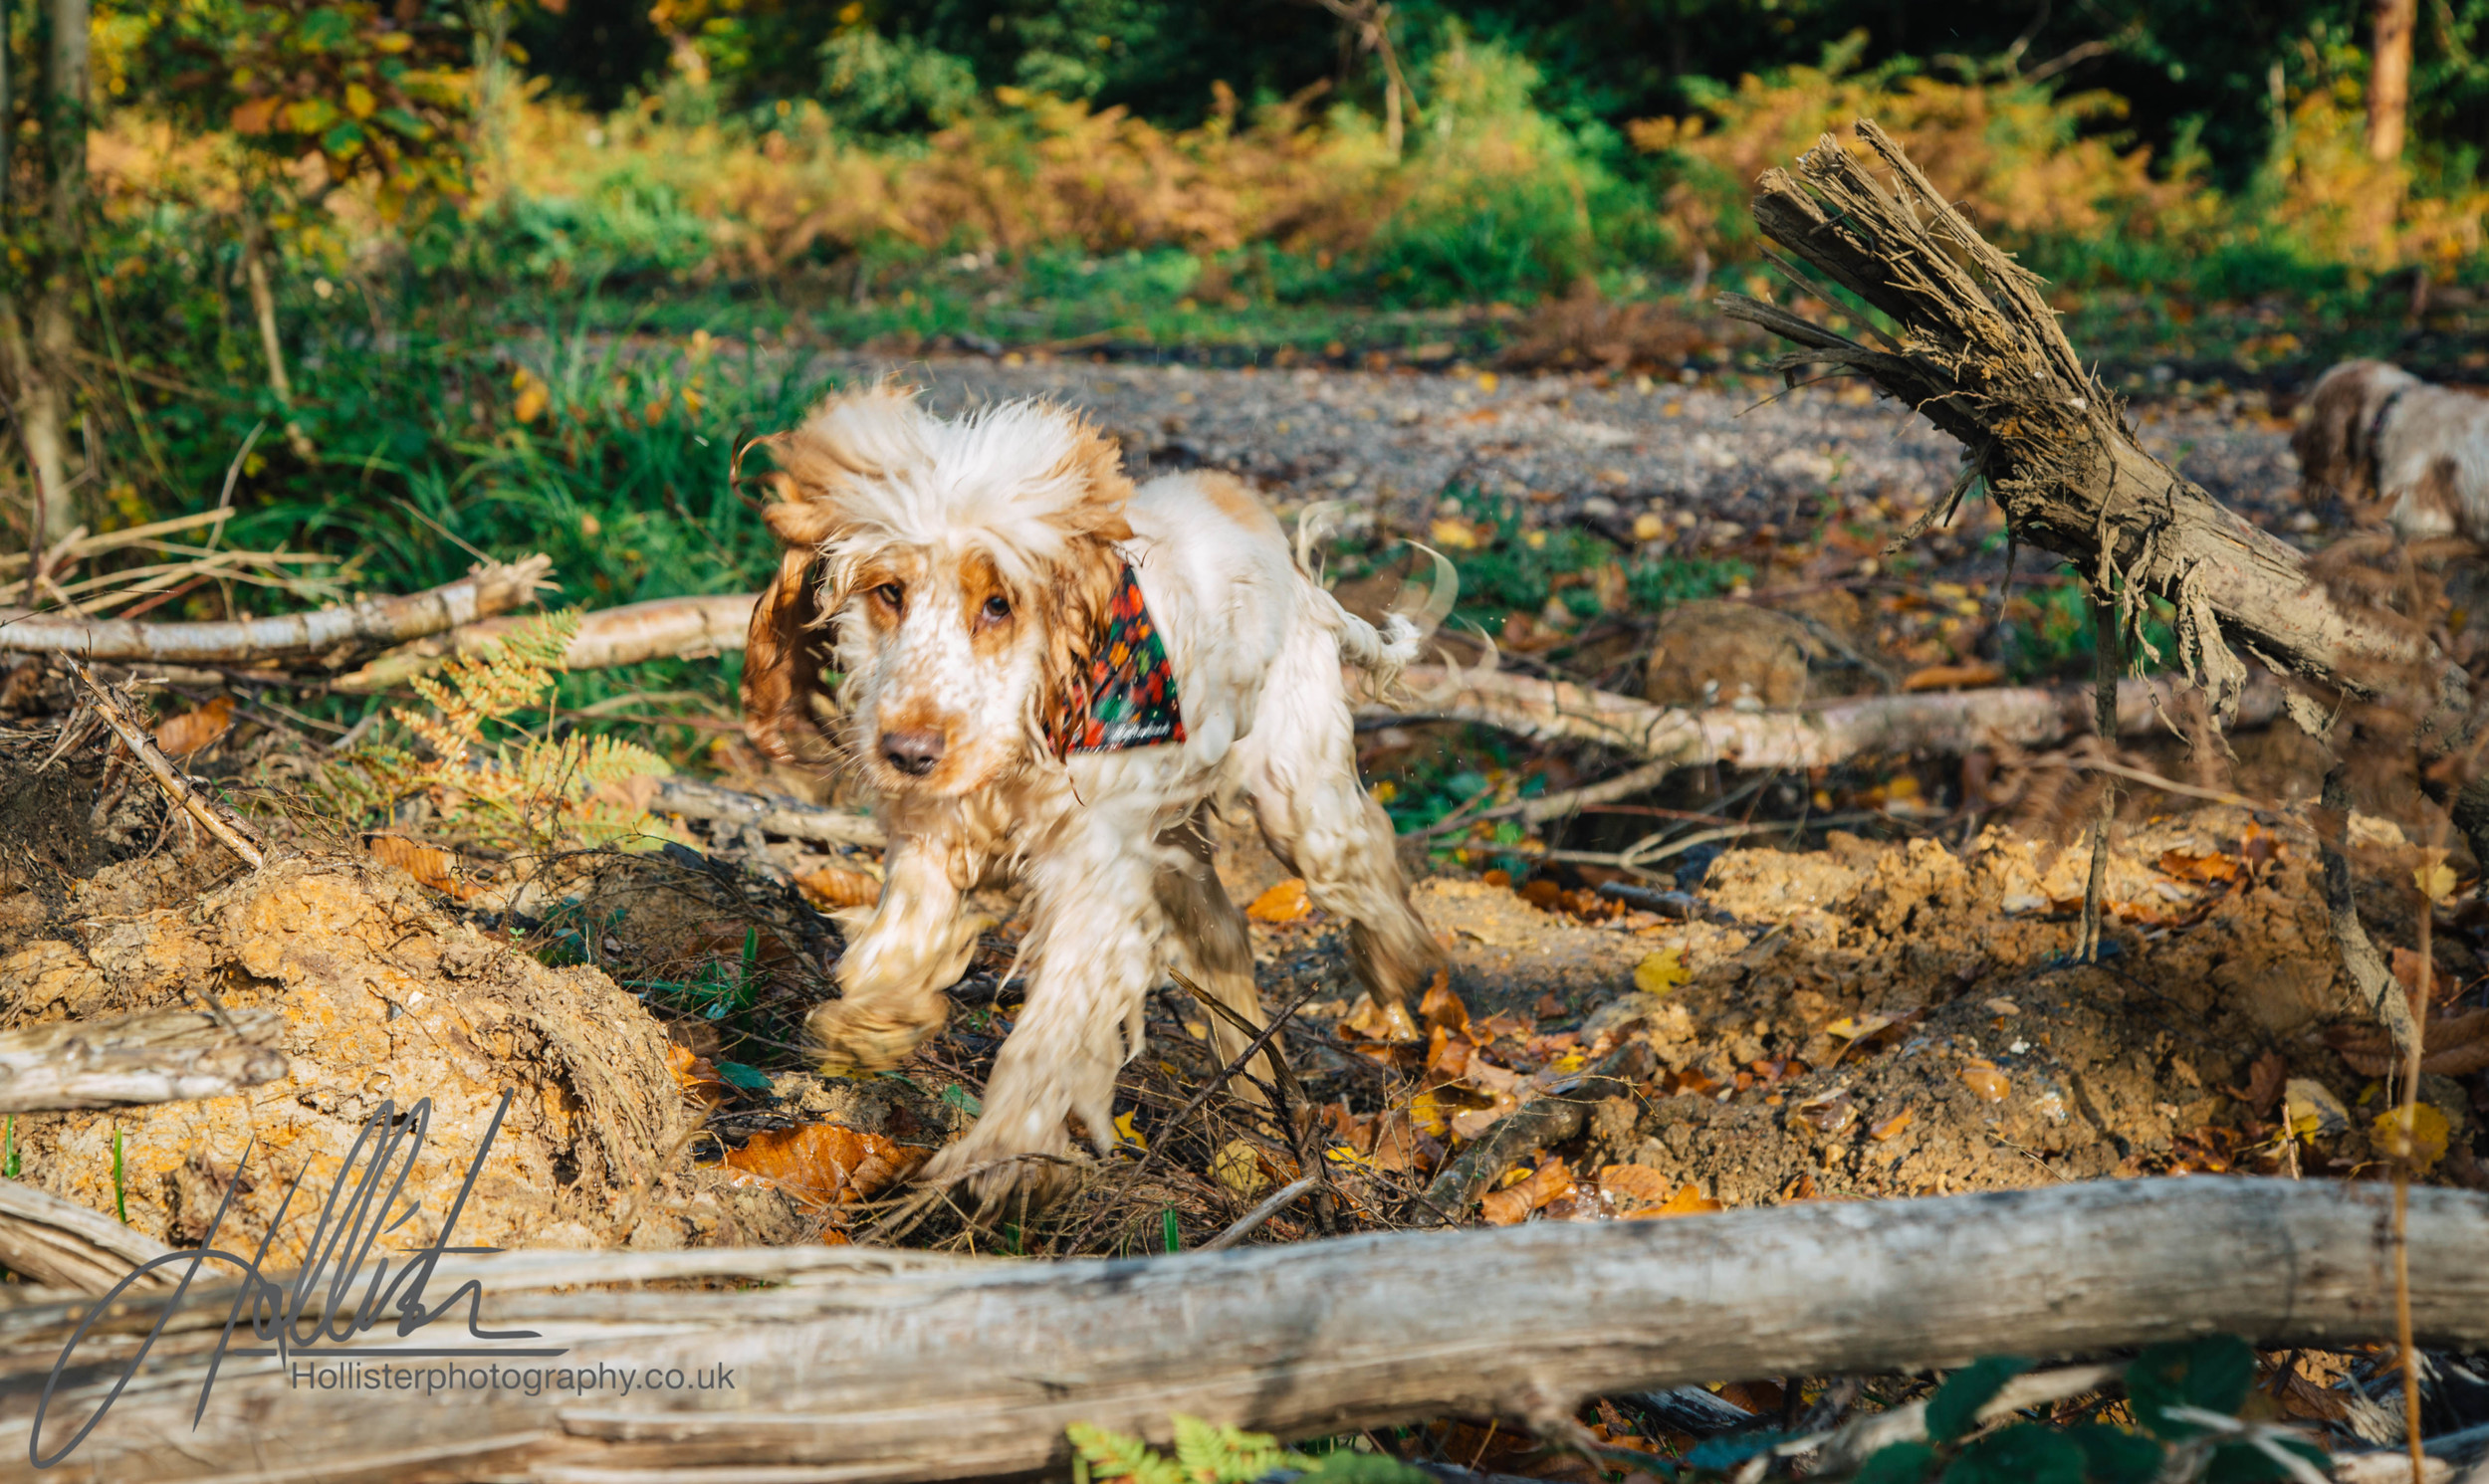 Hollisterphotography ABBY CLOWES WOOD DOG WALK-36.JPG